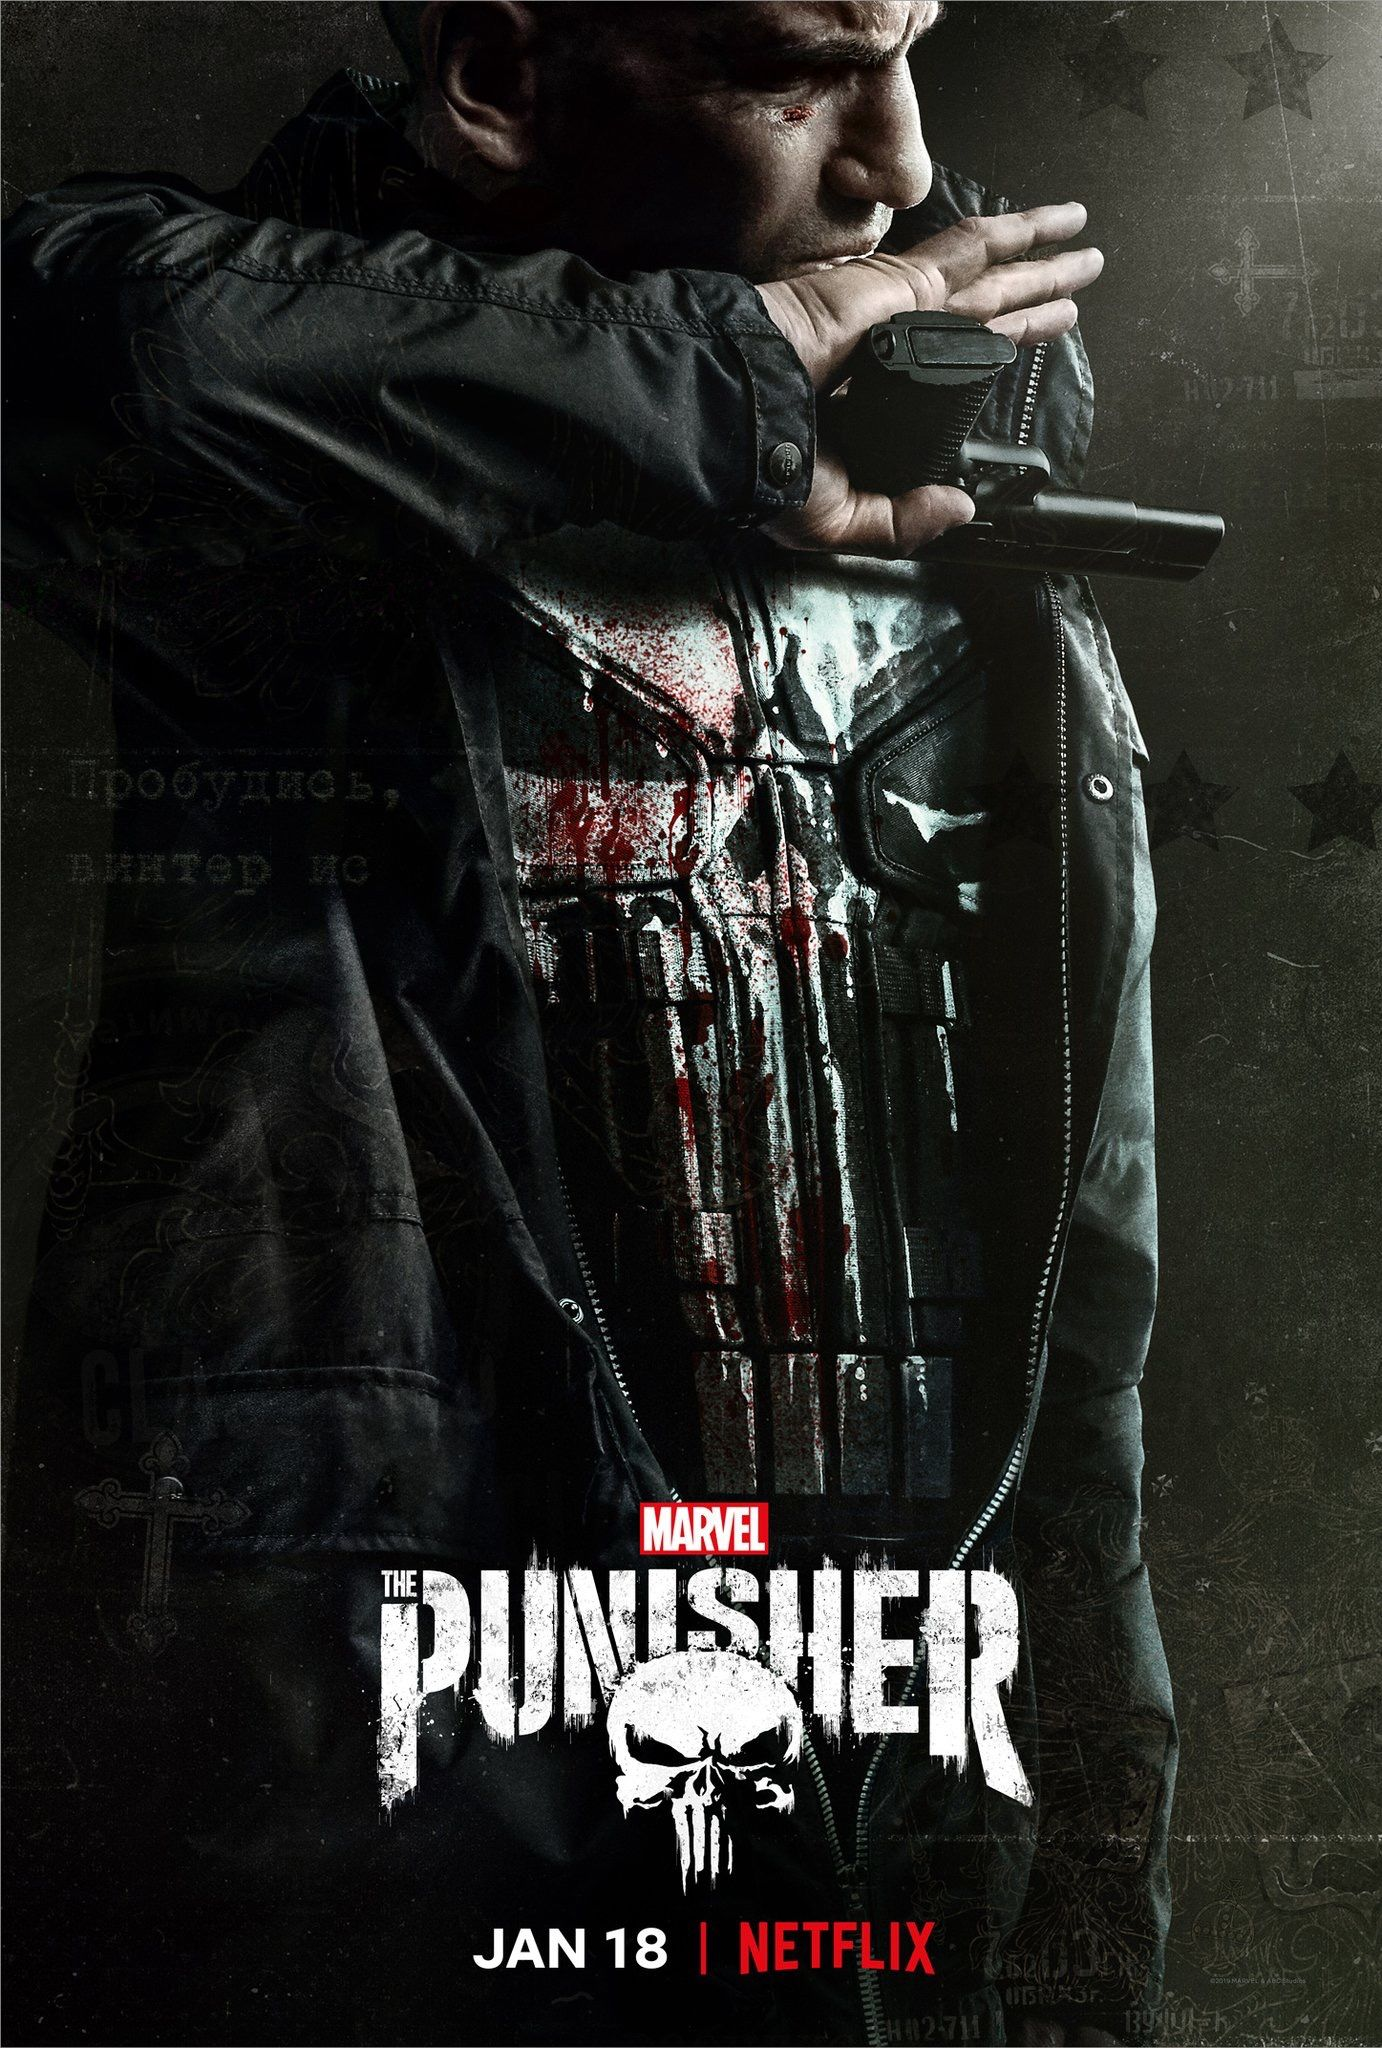 Marvel's The Punisher ne zaman